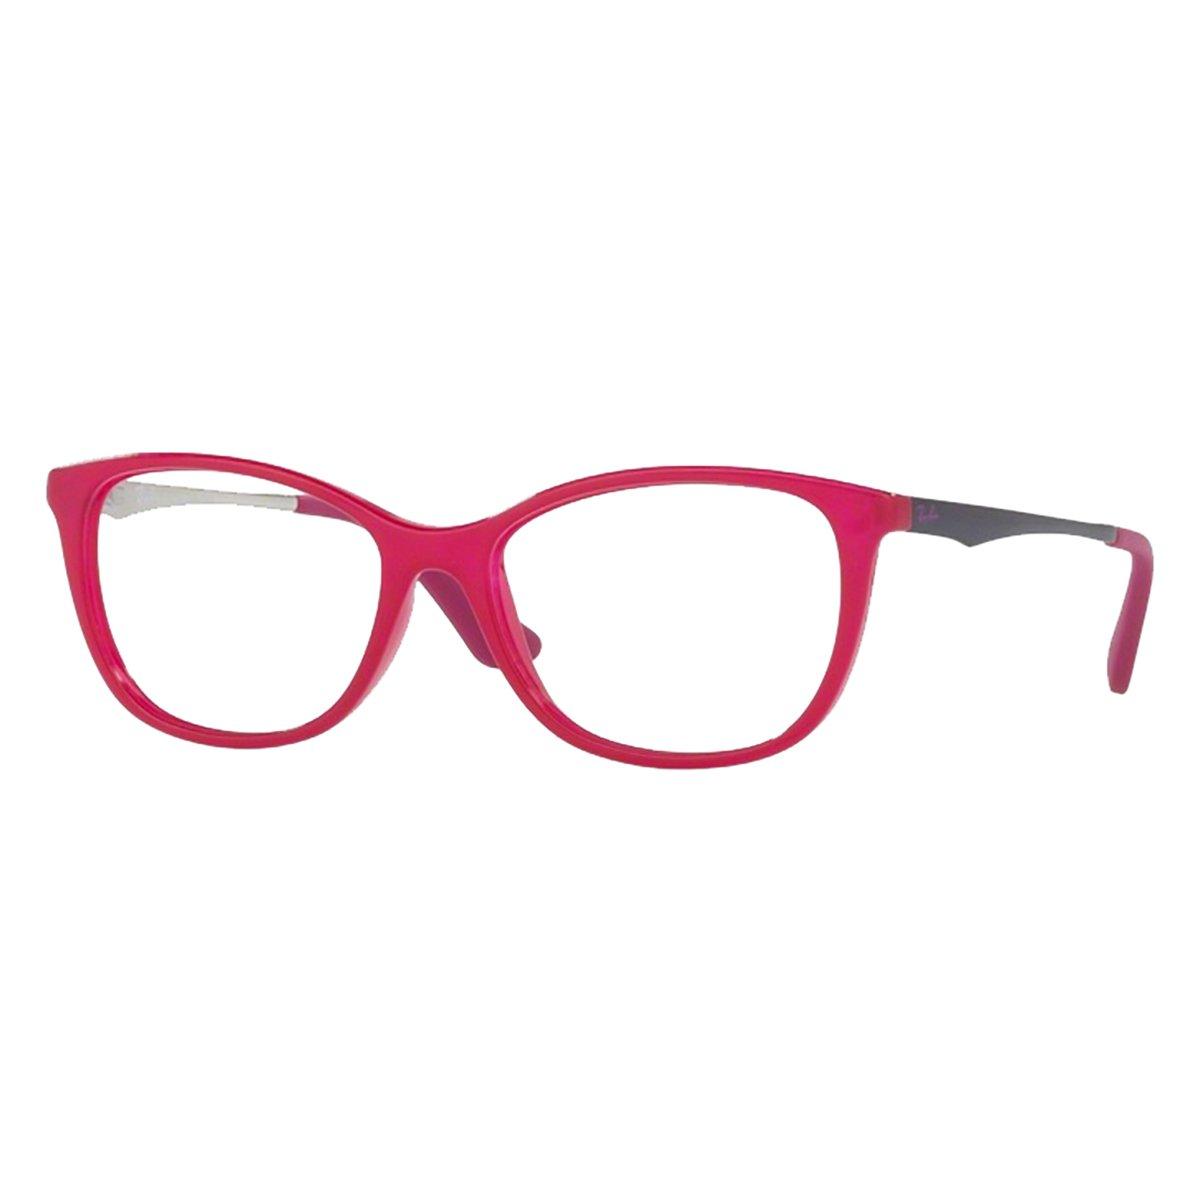 9be20cc95a307 Compre Óculos de Grau Ray Ban Infantil em 10X